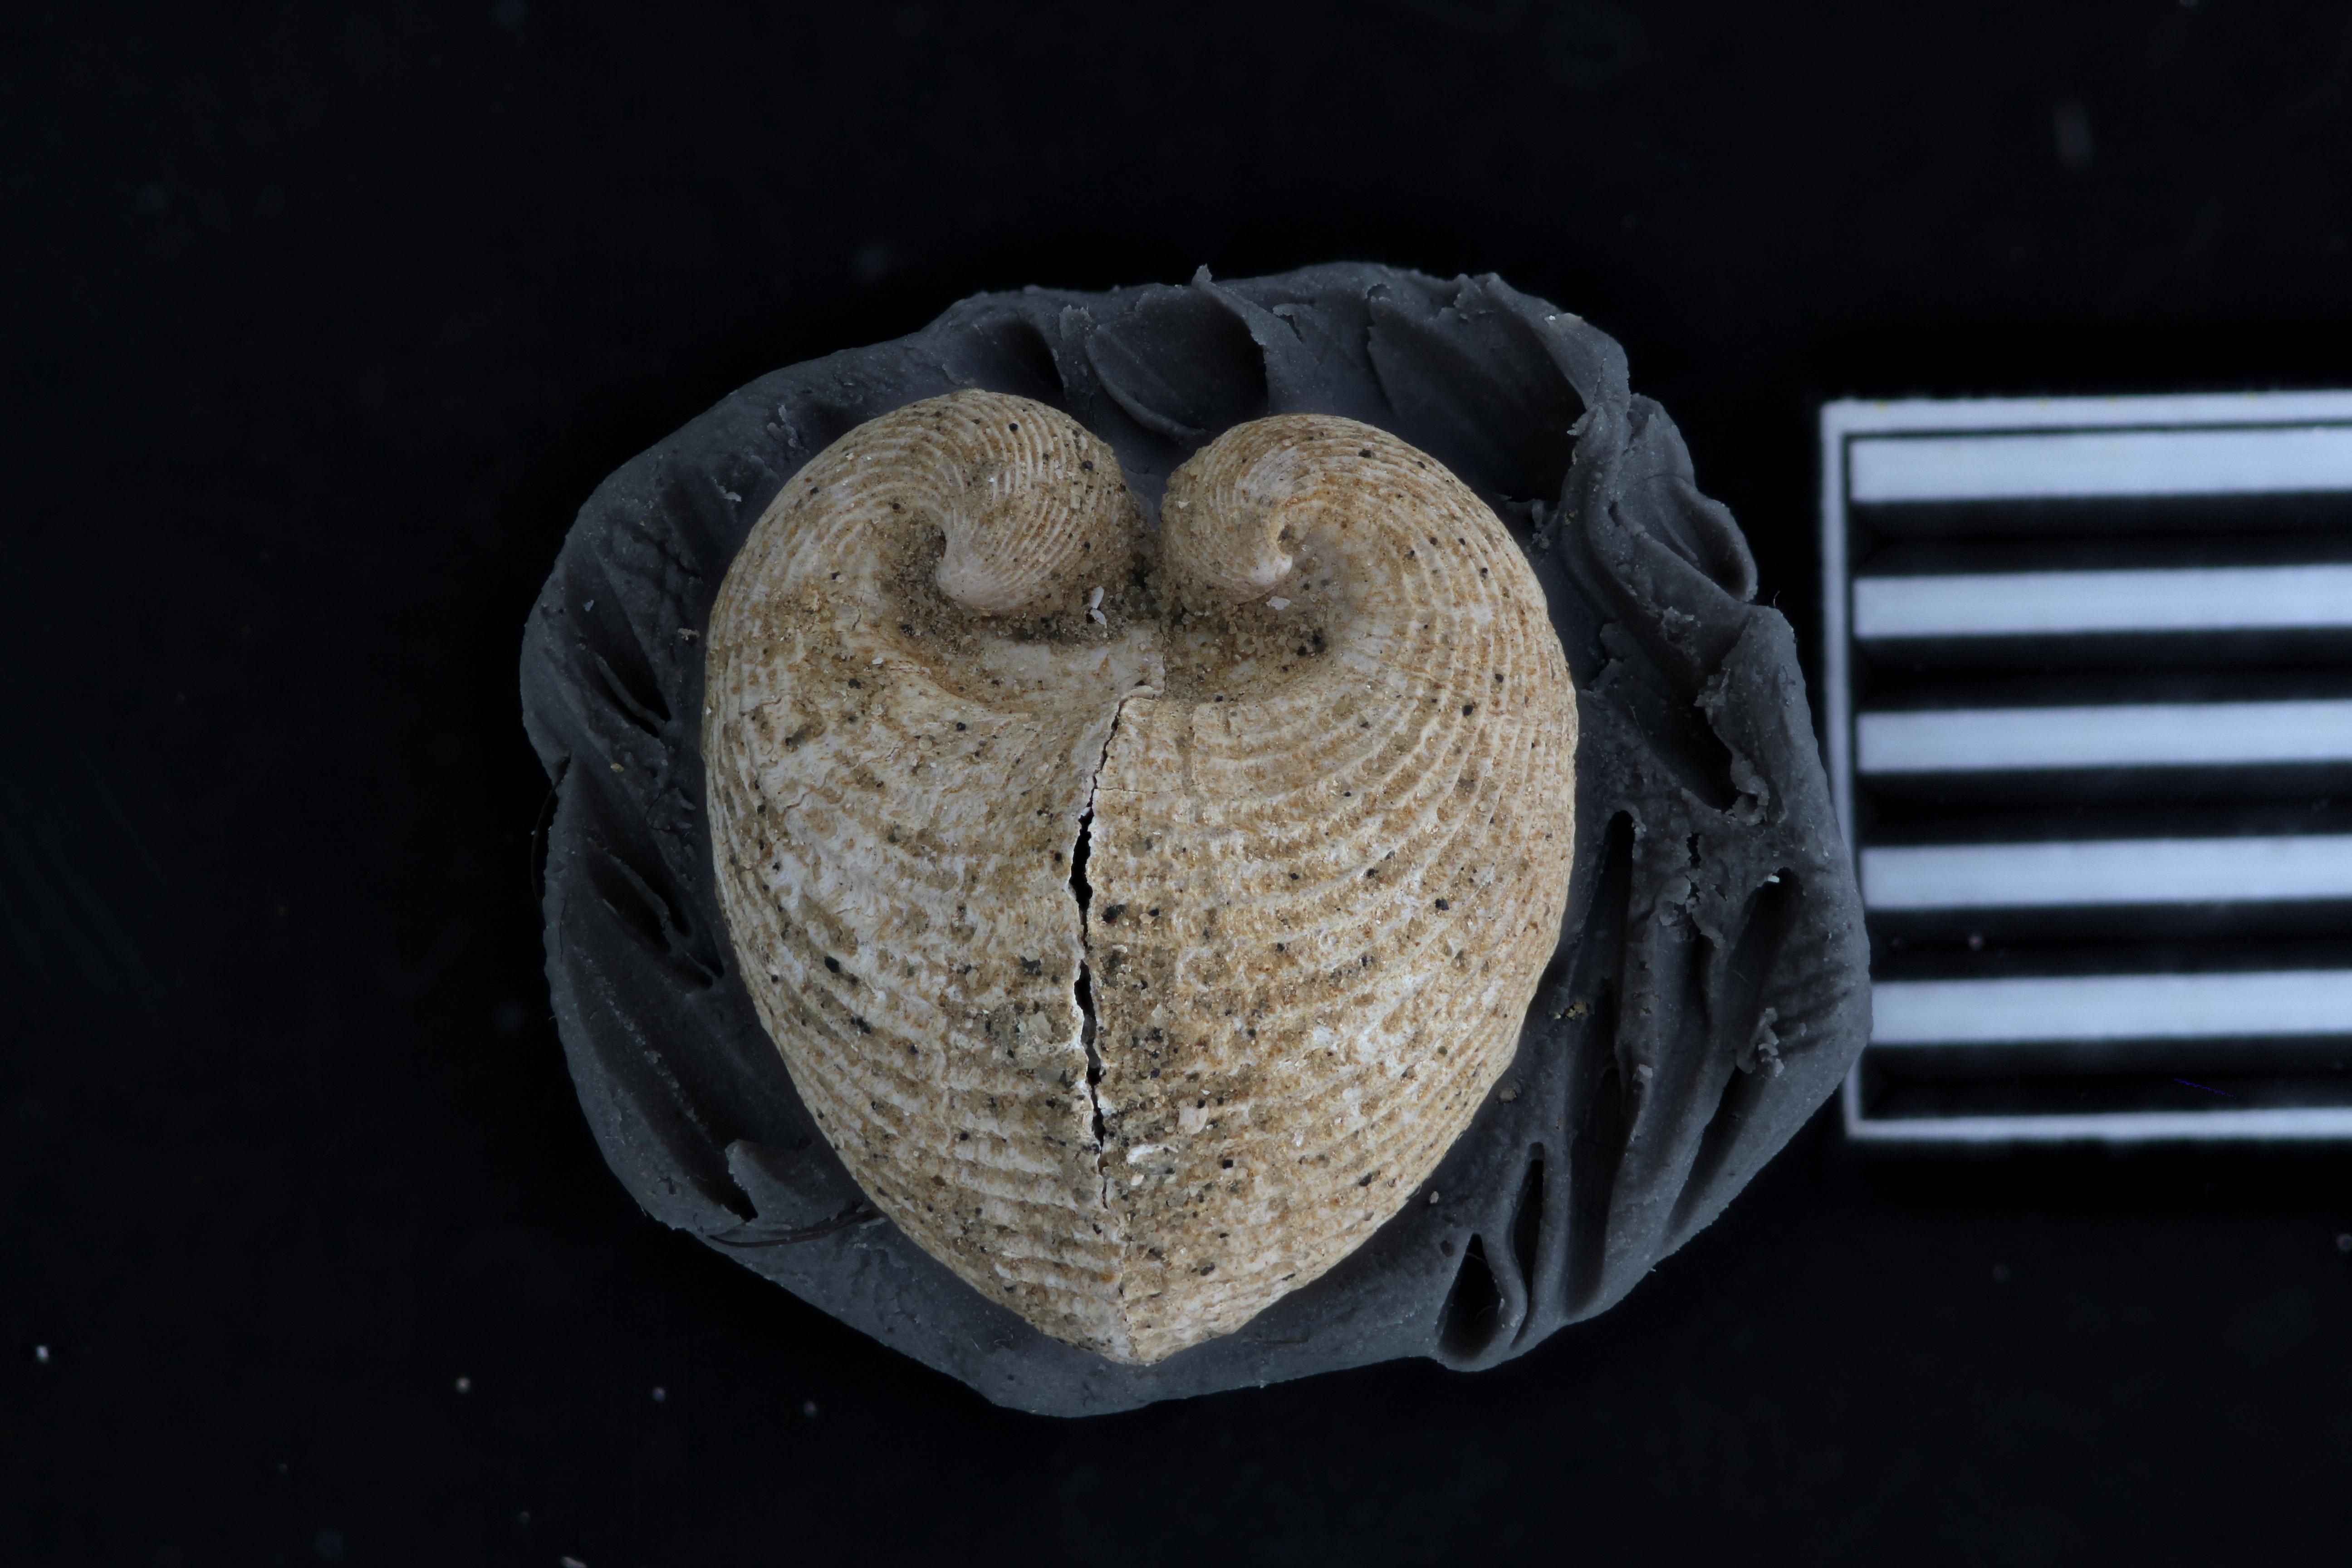 Pecchiolia wemmelensis (photostacking)